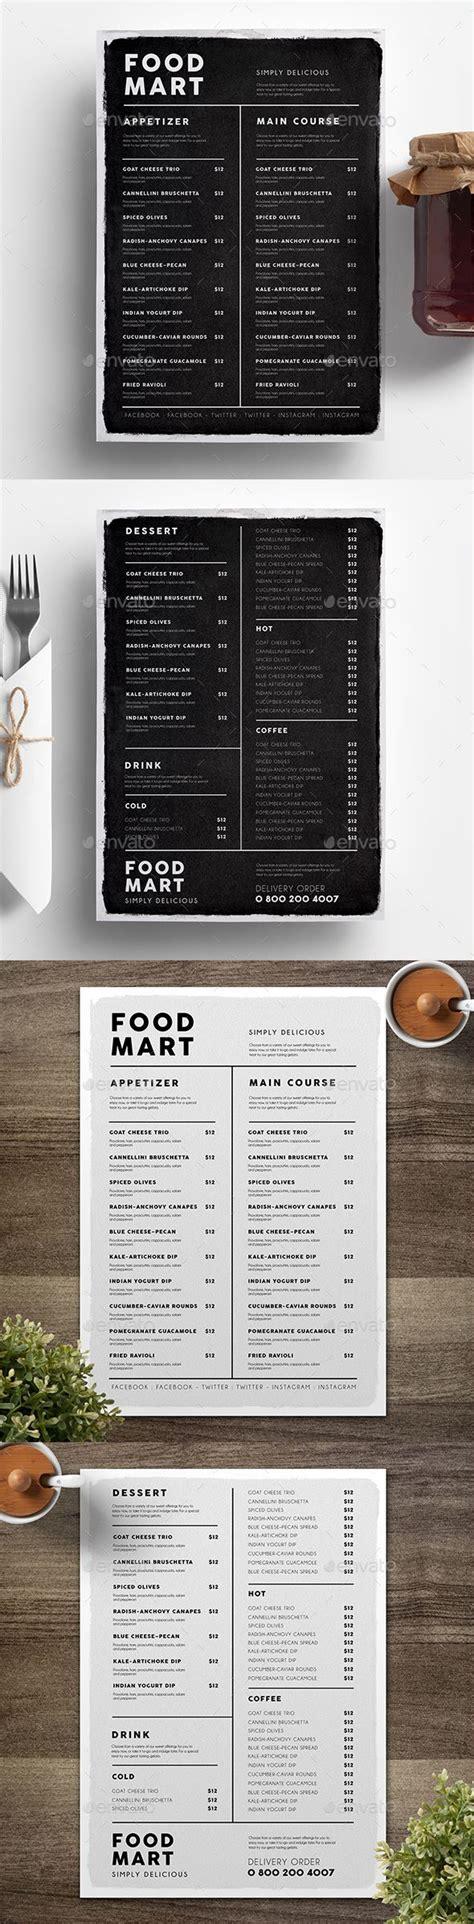 oddfellows menu a simple and sleek menu general design regarding